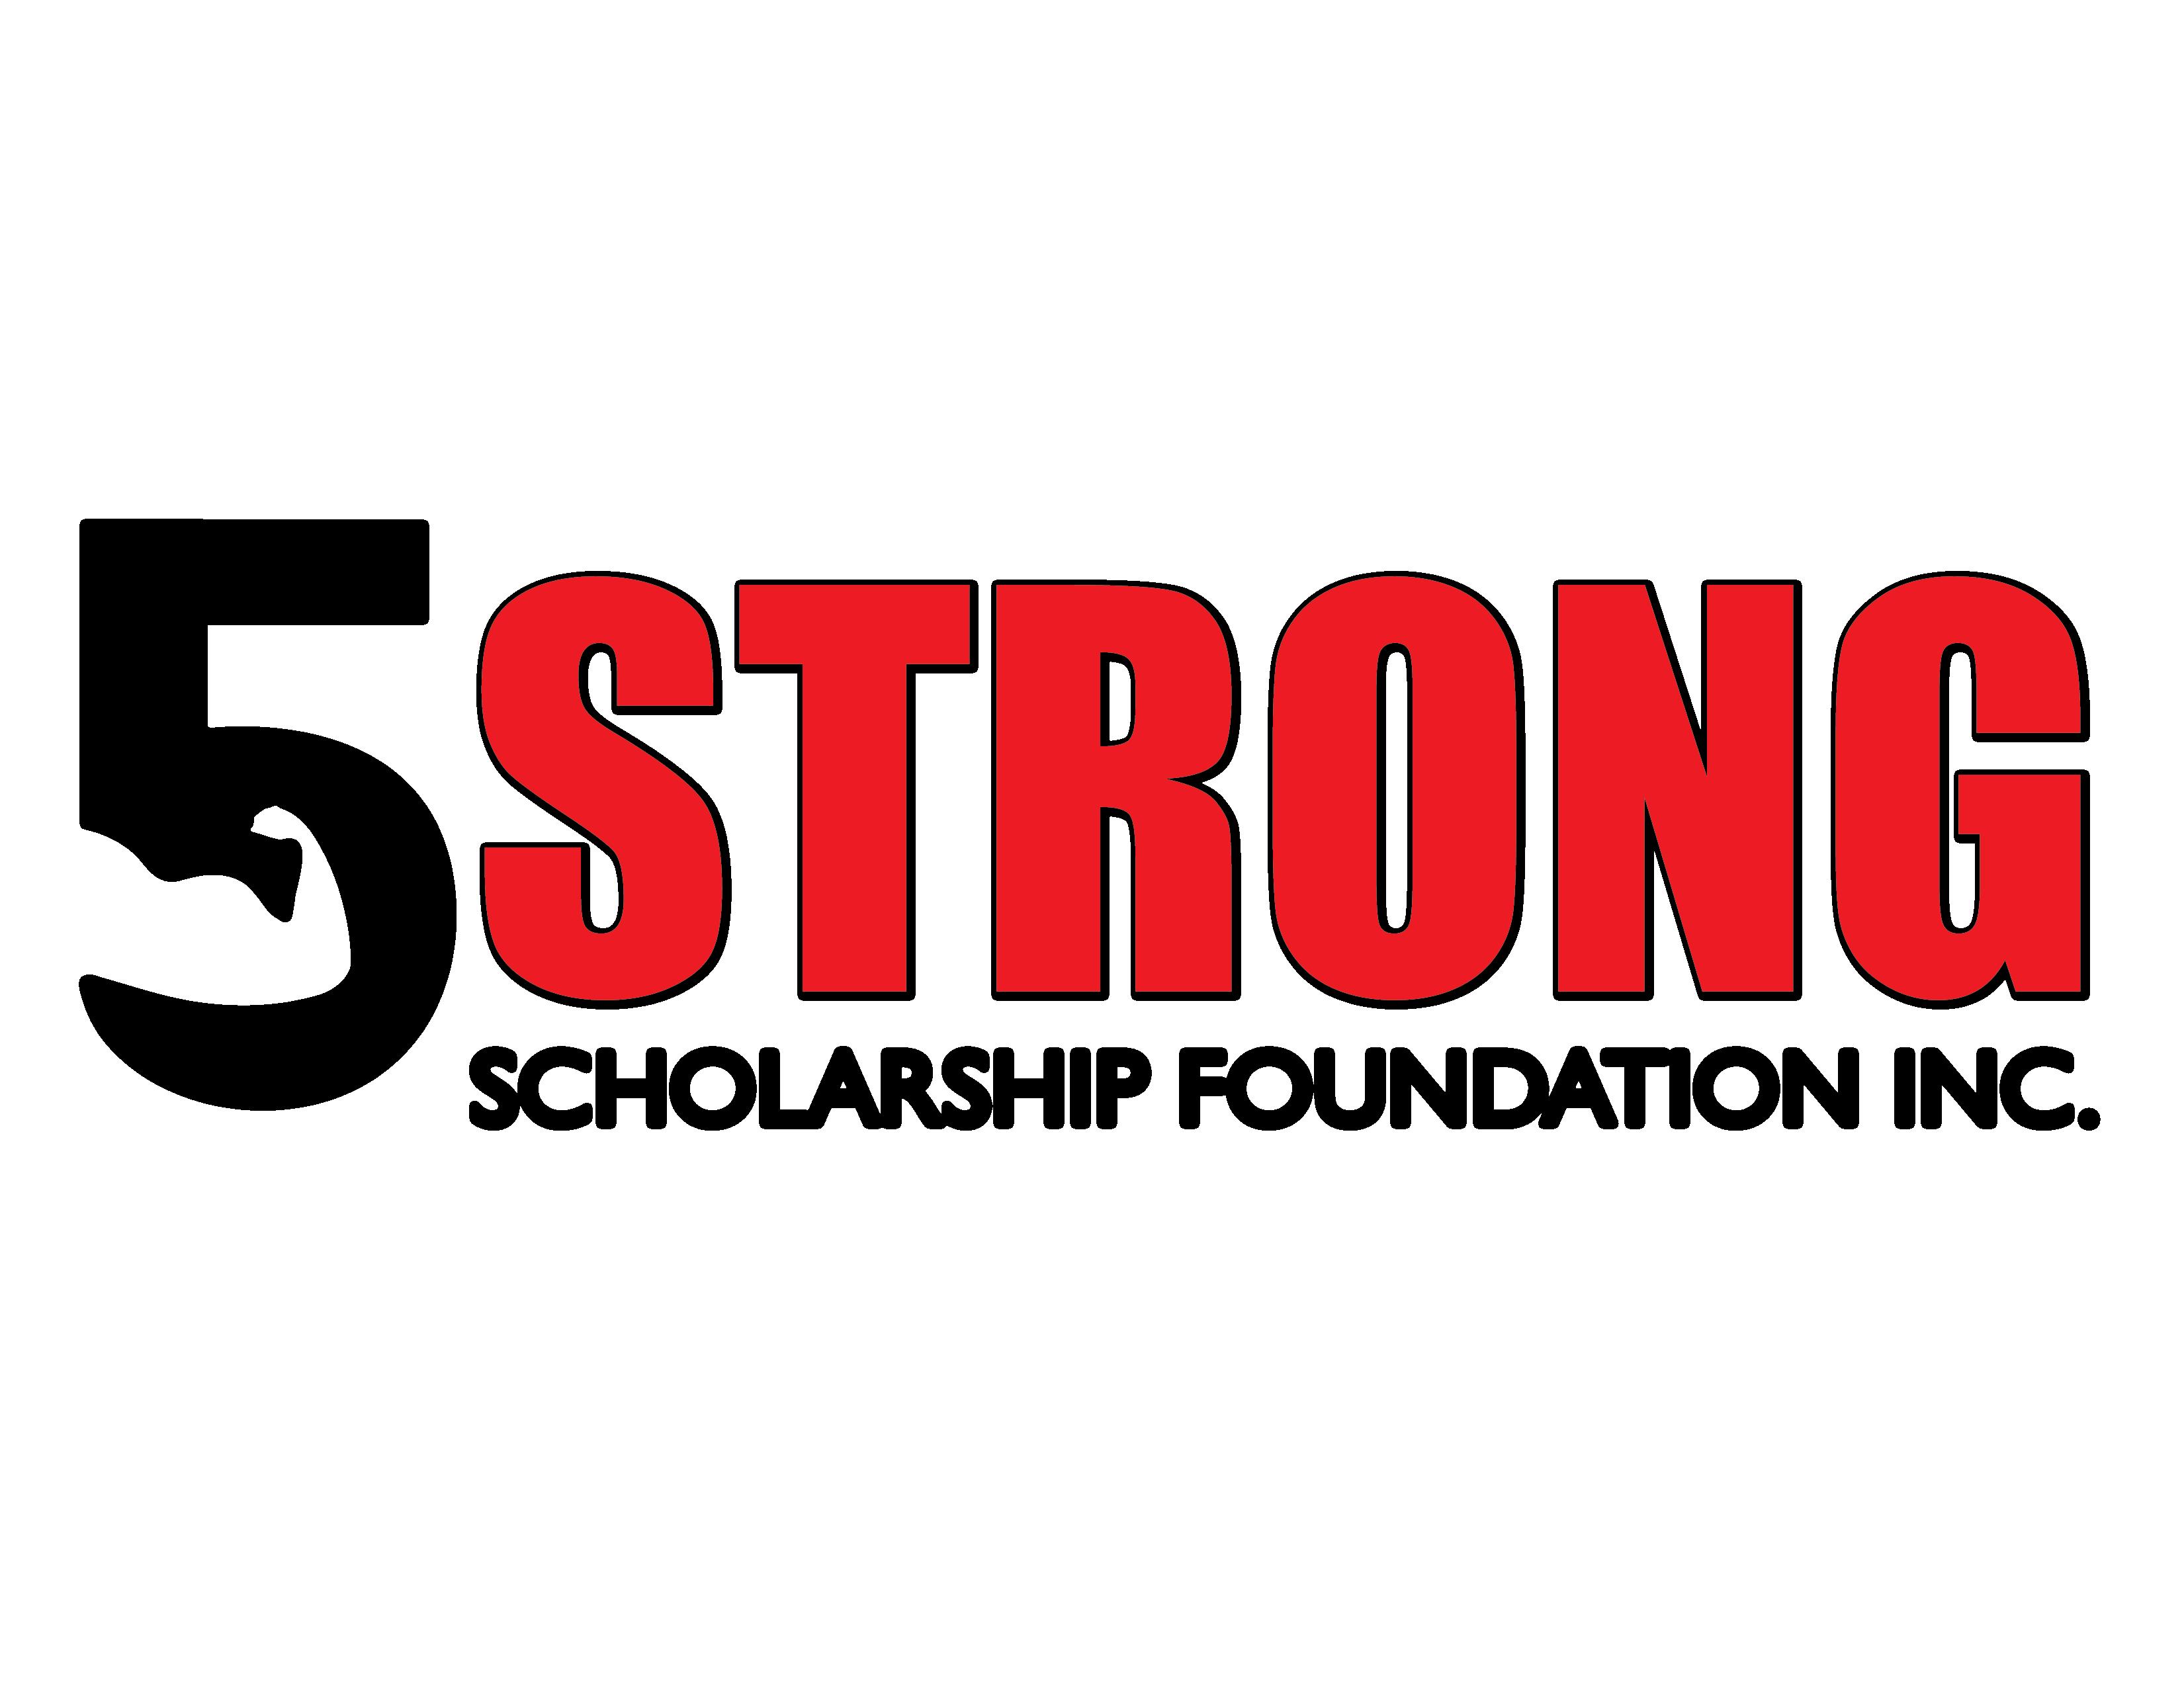 5 Strong Scholarship Foundation